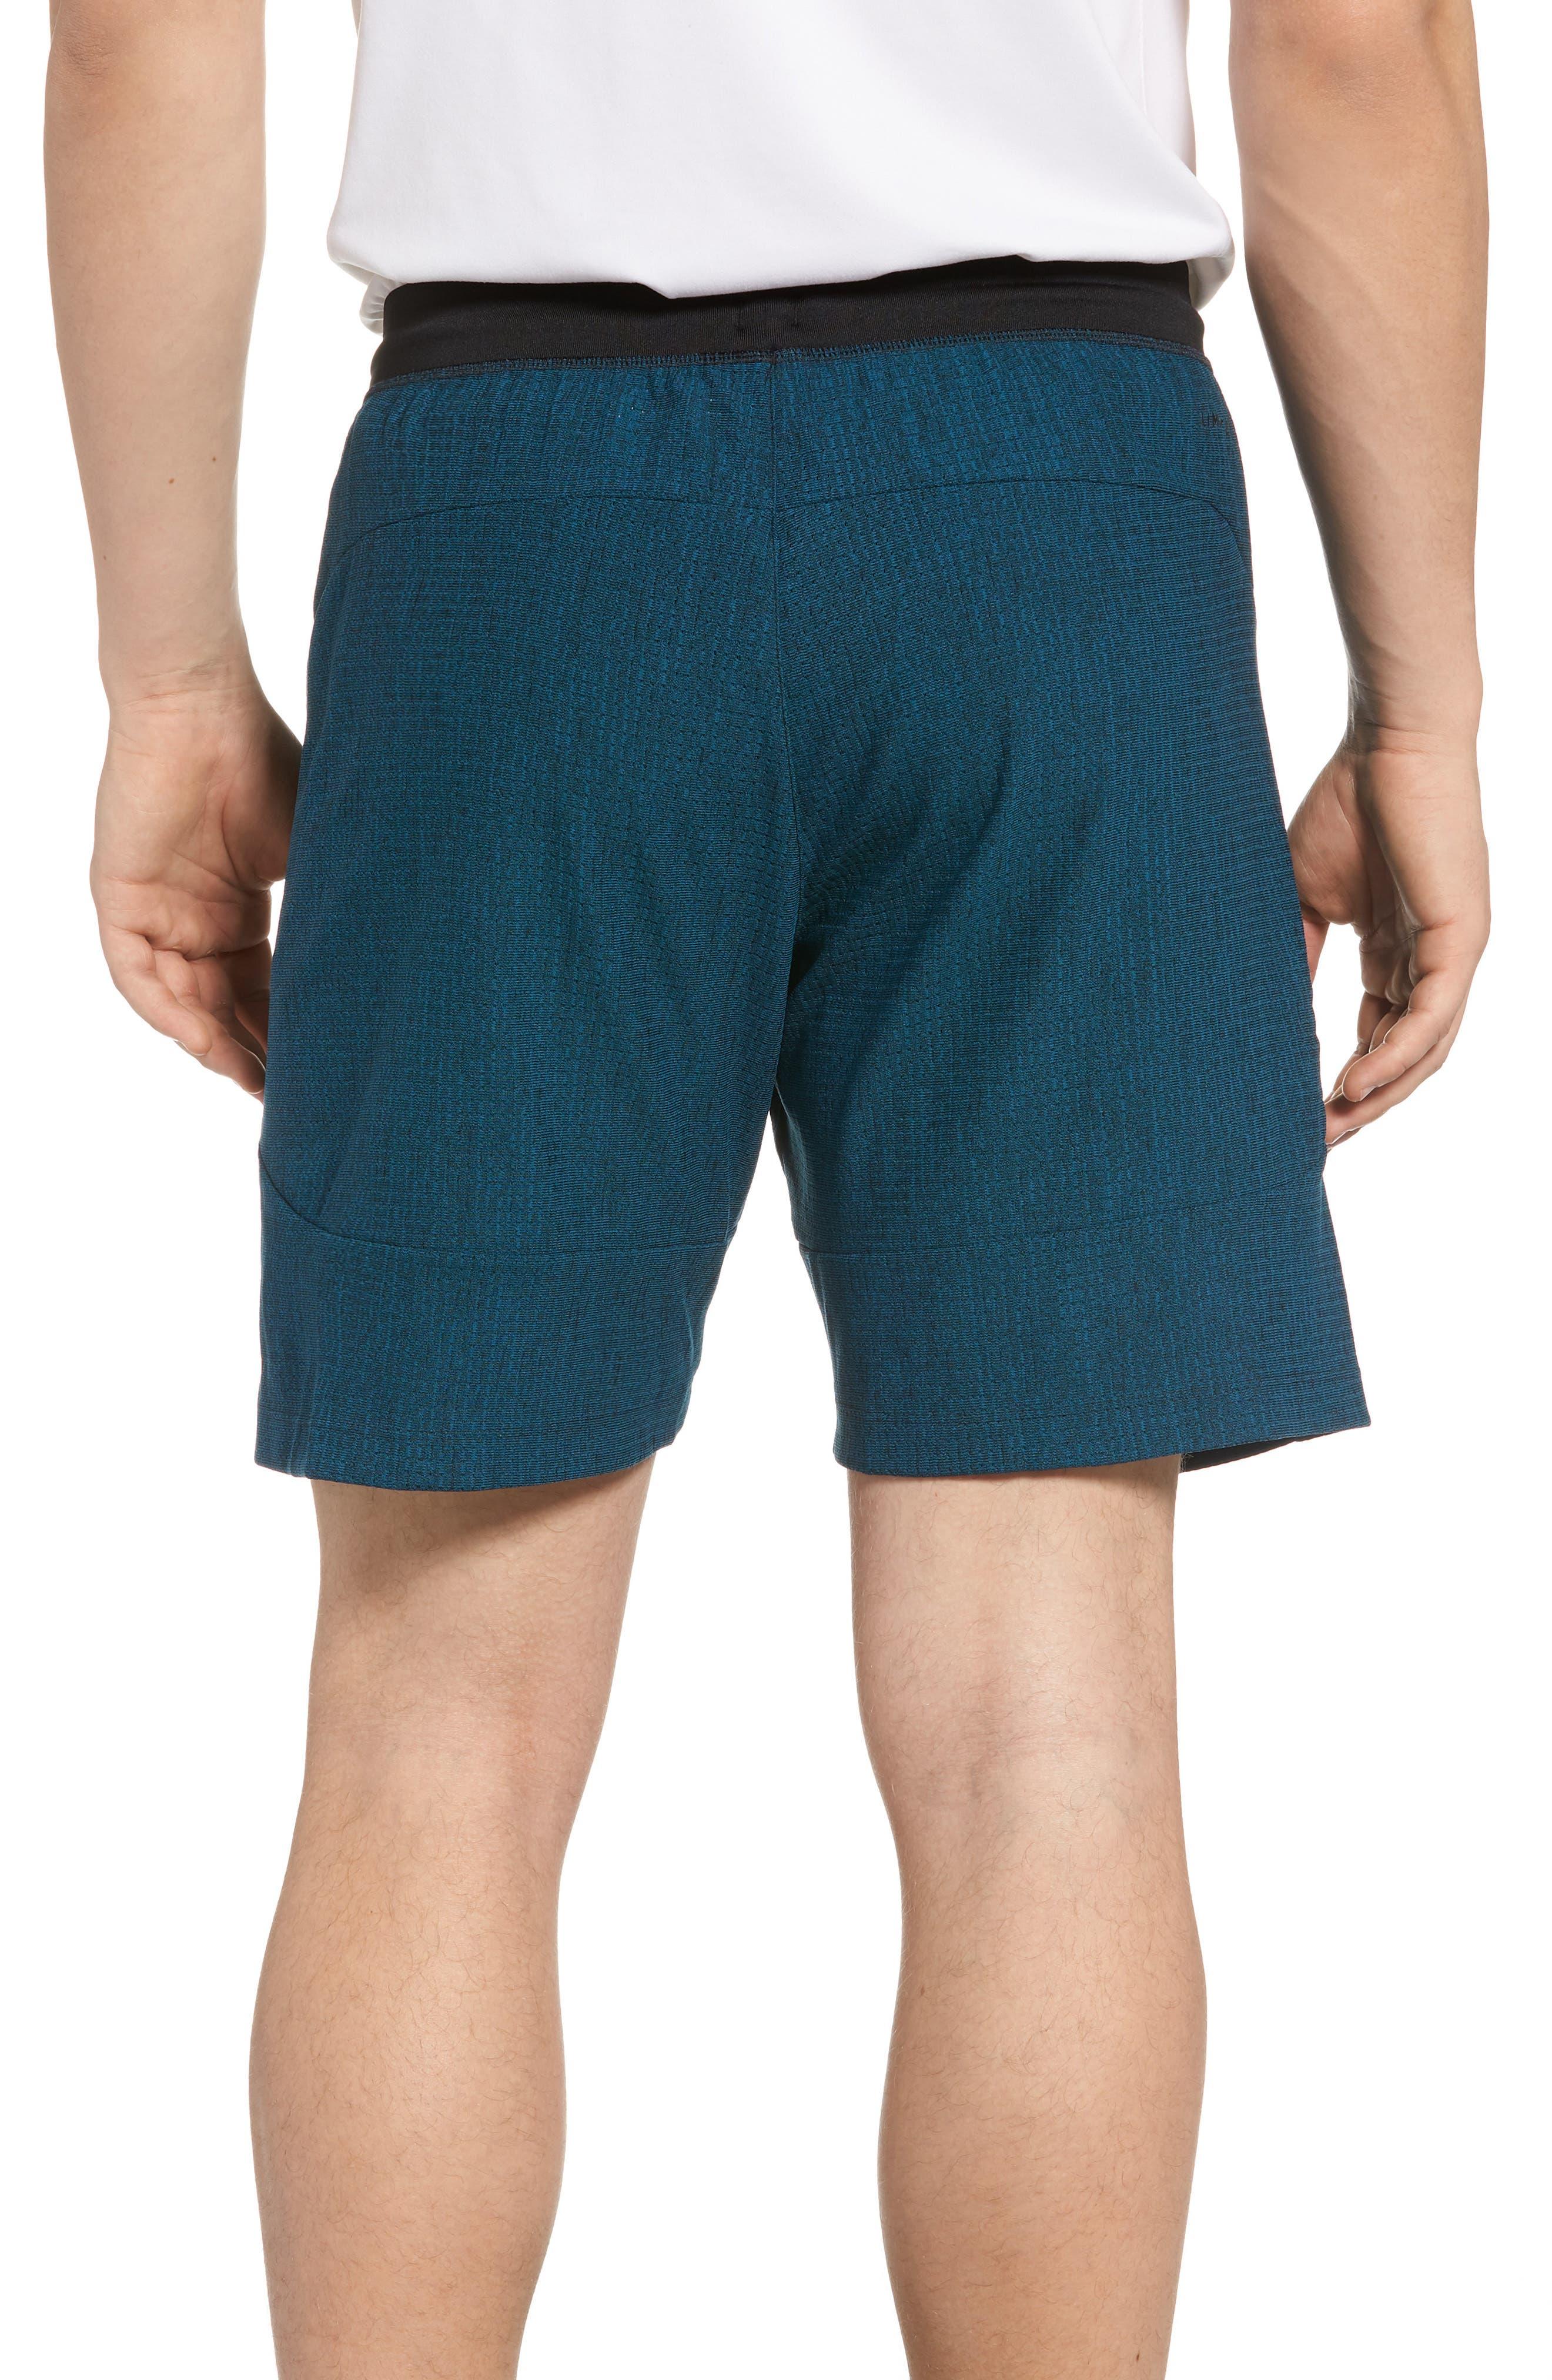 Speedbreaker Shorts,                             Alternate thumbnail 2, color,                             Real Teal